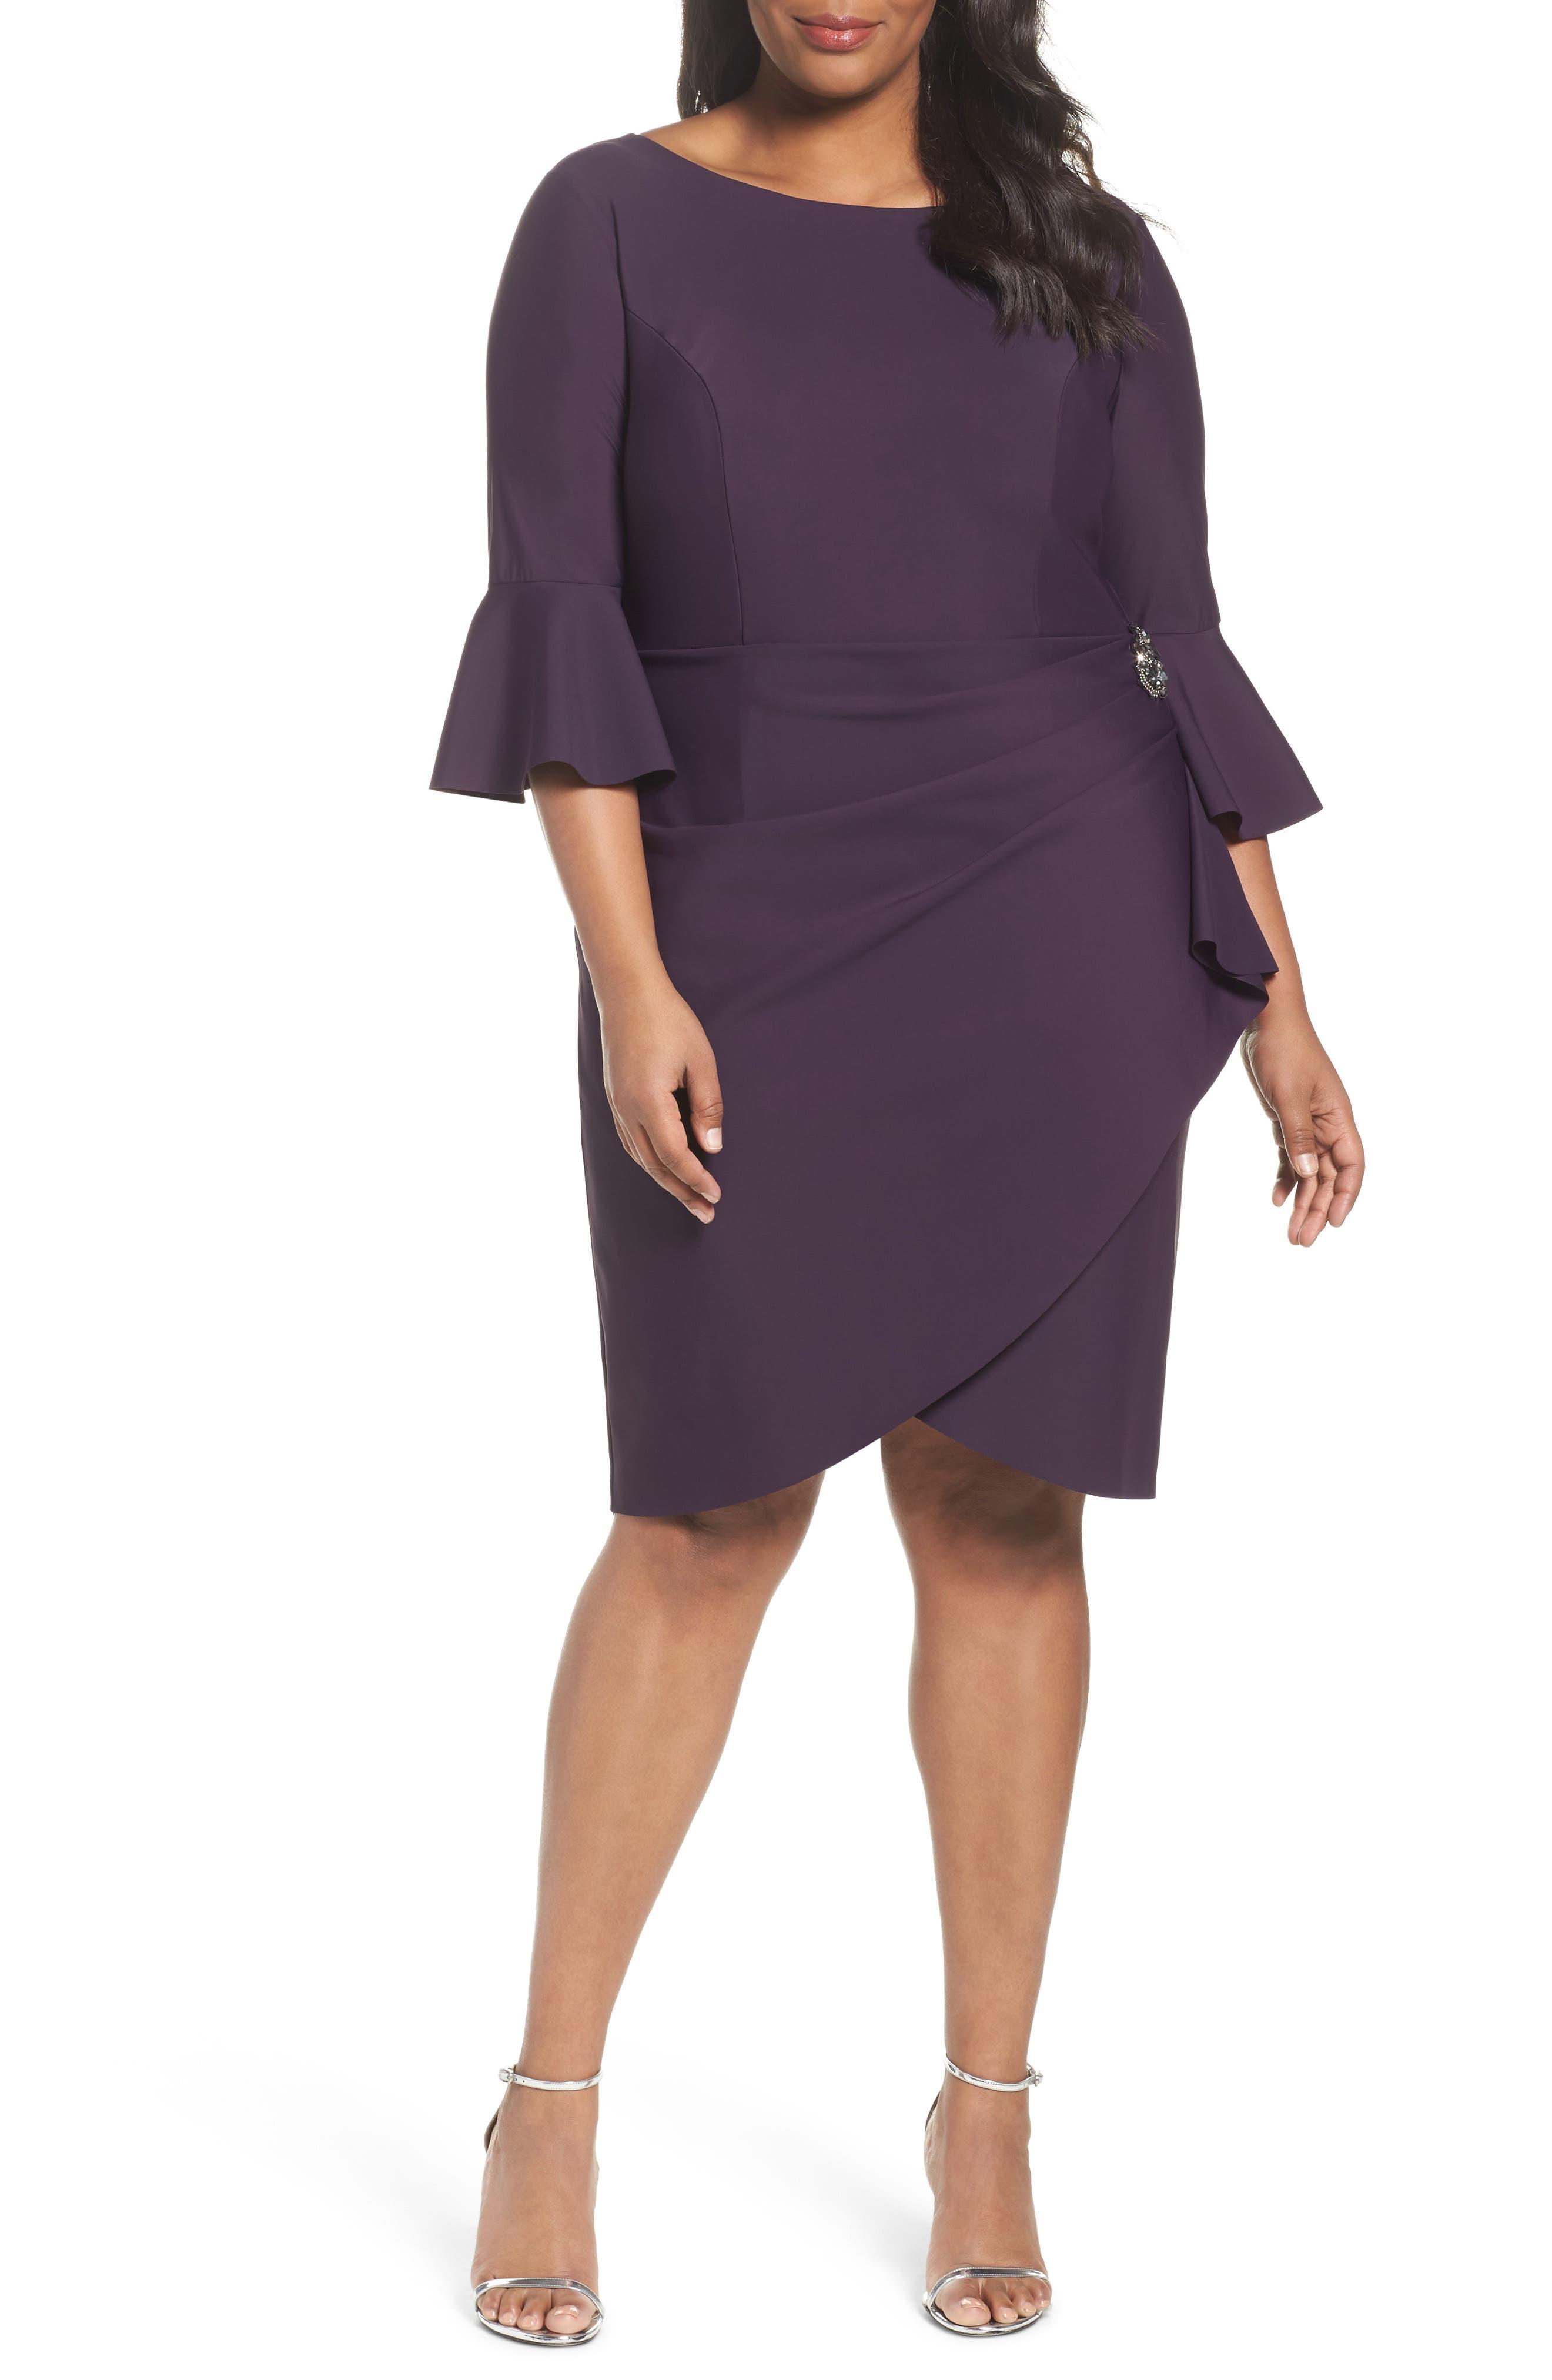 Alternate Image 1 Selected - Alex Evenings Bell Sleeve Sheath Dress (Plus Size)